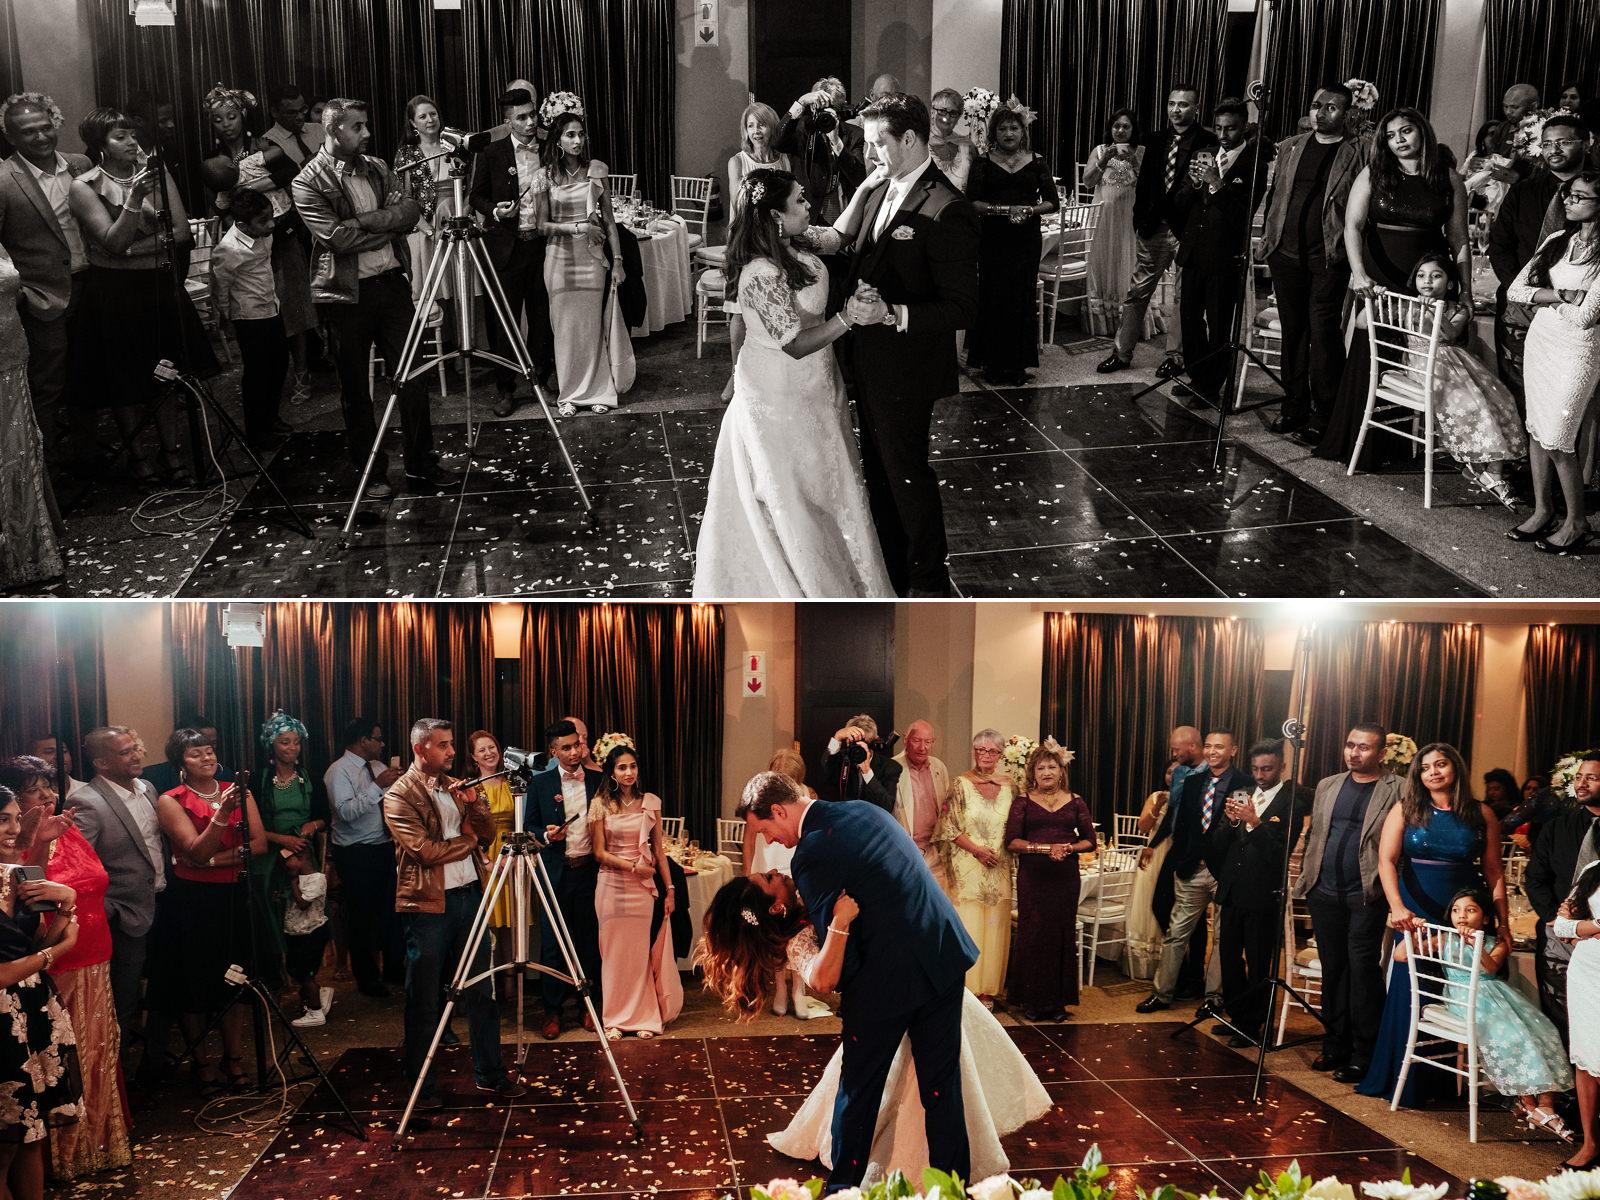 Mt_Edgecombe_Durban_Wedding_Photography_RBadal_28.jpg